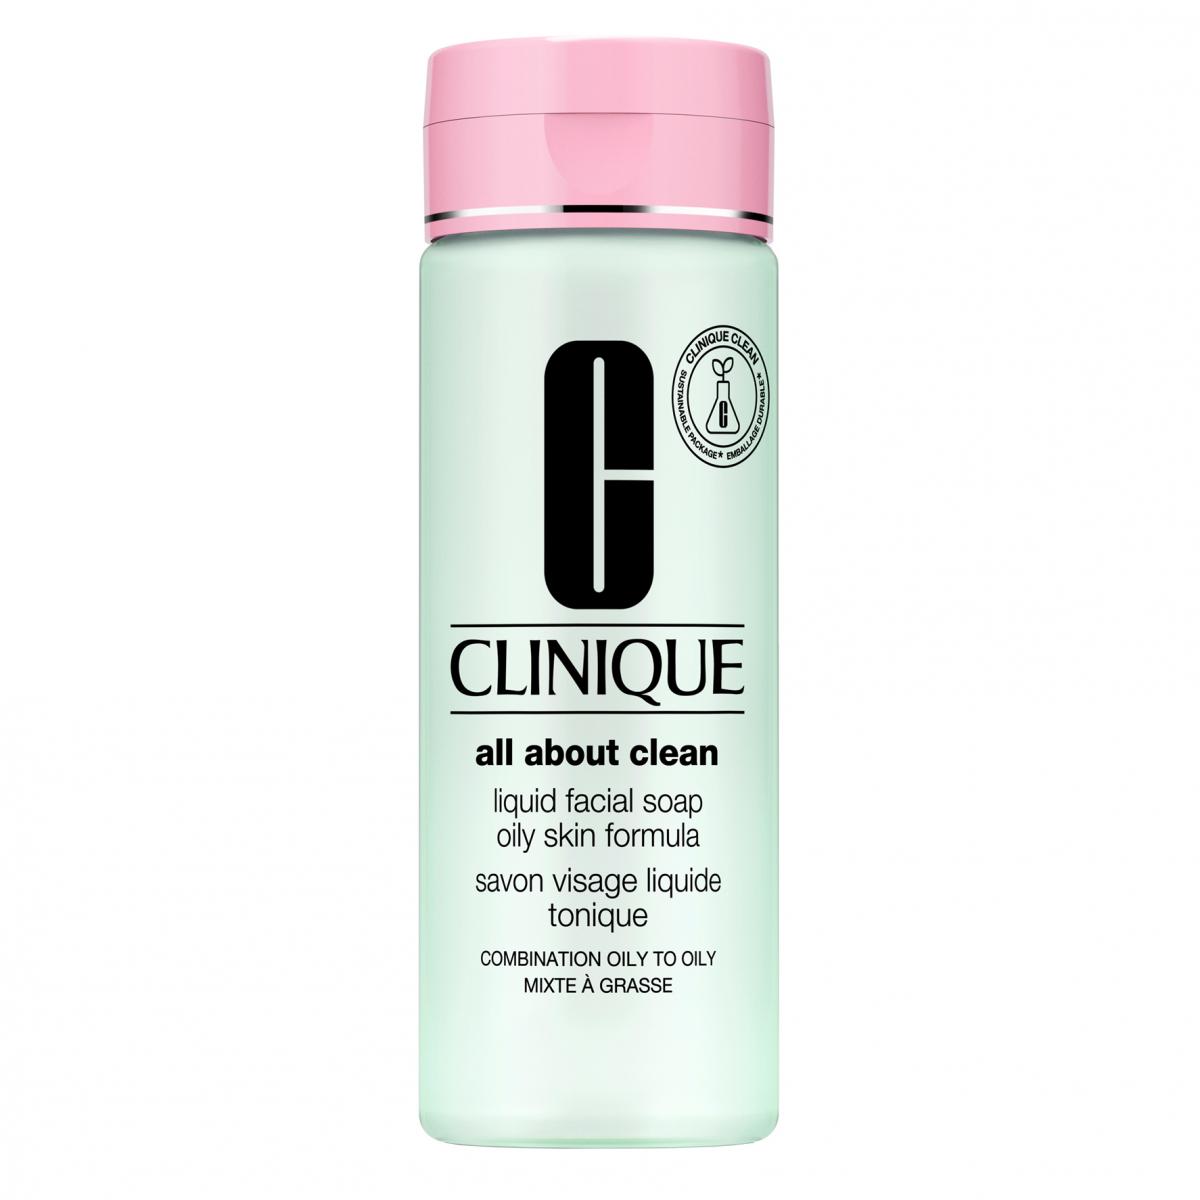 Clinique Liquid Facial Soap Oily Skin 200 ml